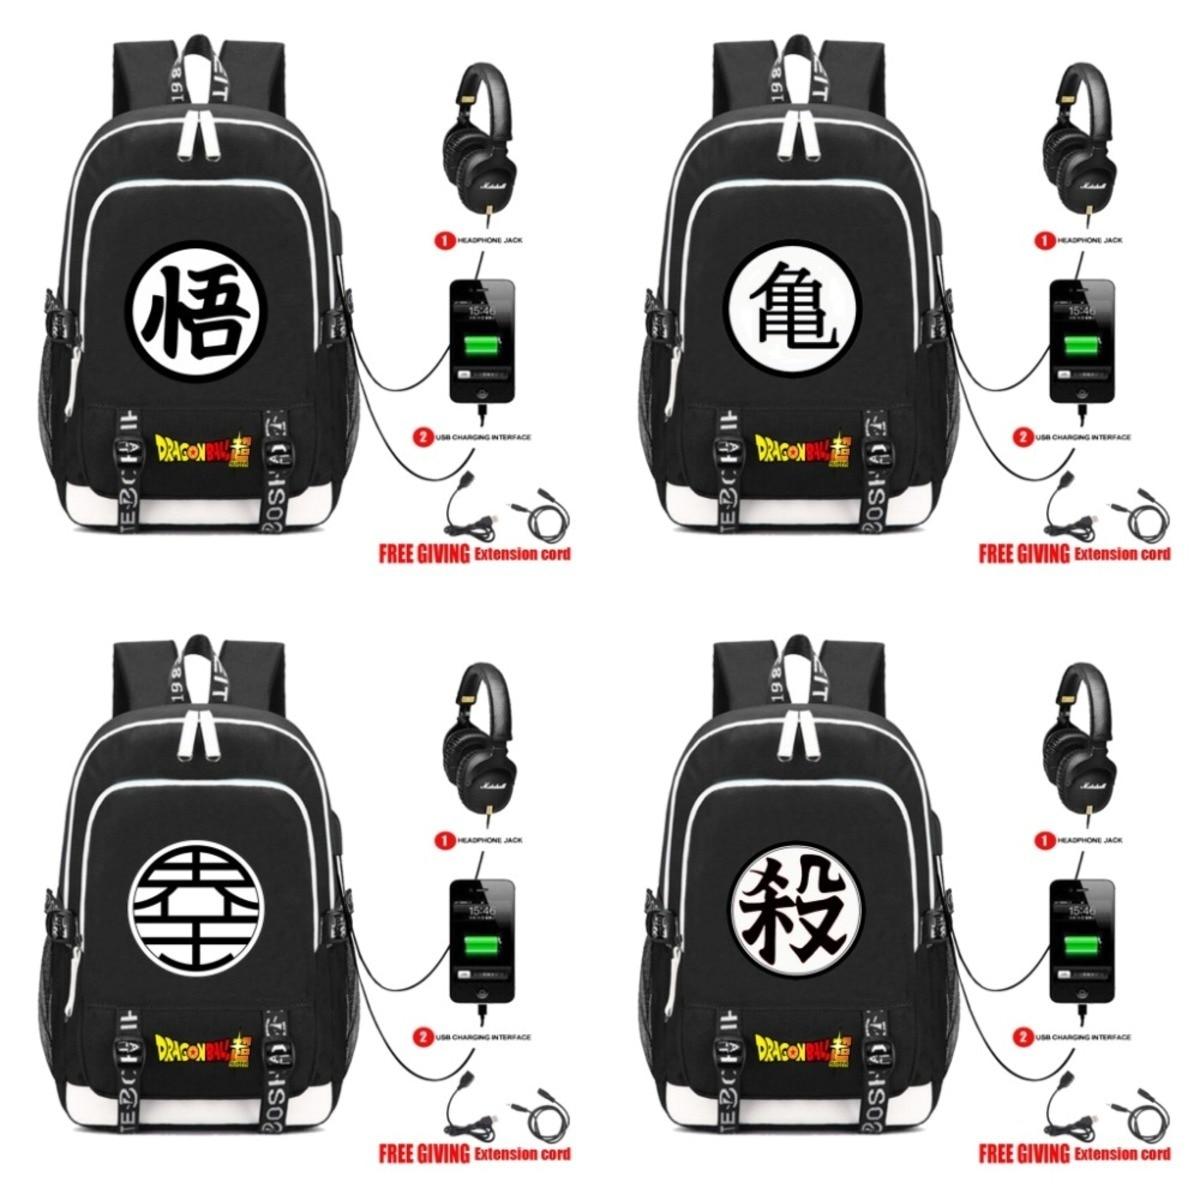 USB charging Headphone jack Rucksacks Japan anime Dragon Ball Z Backpack Kakarotto Goku cosplay Teenagers Laptop bag School Bags usb charging headphone jack rucksacks japan anime dragon ball z backpack kakarotto goku cosplay teenagers laptop bag school bags